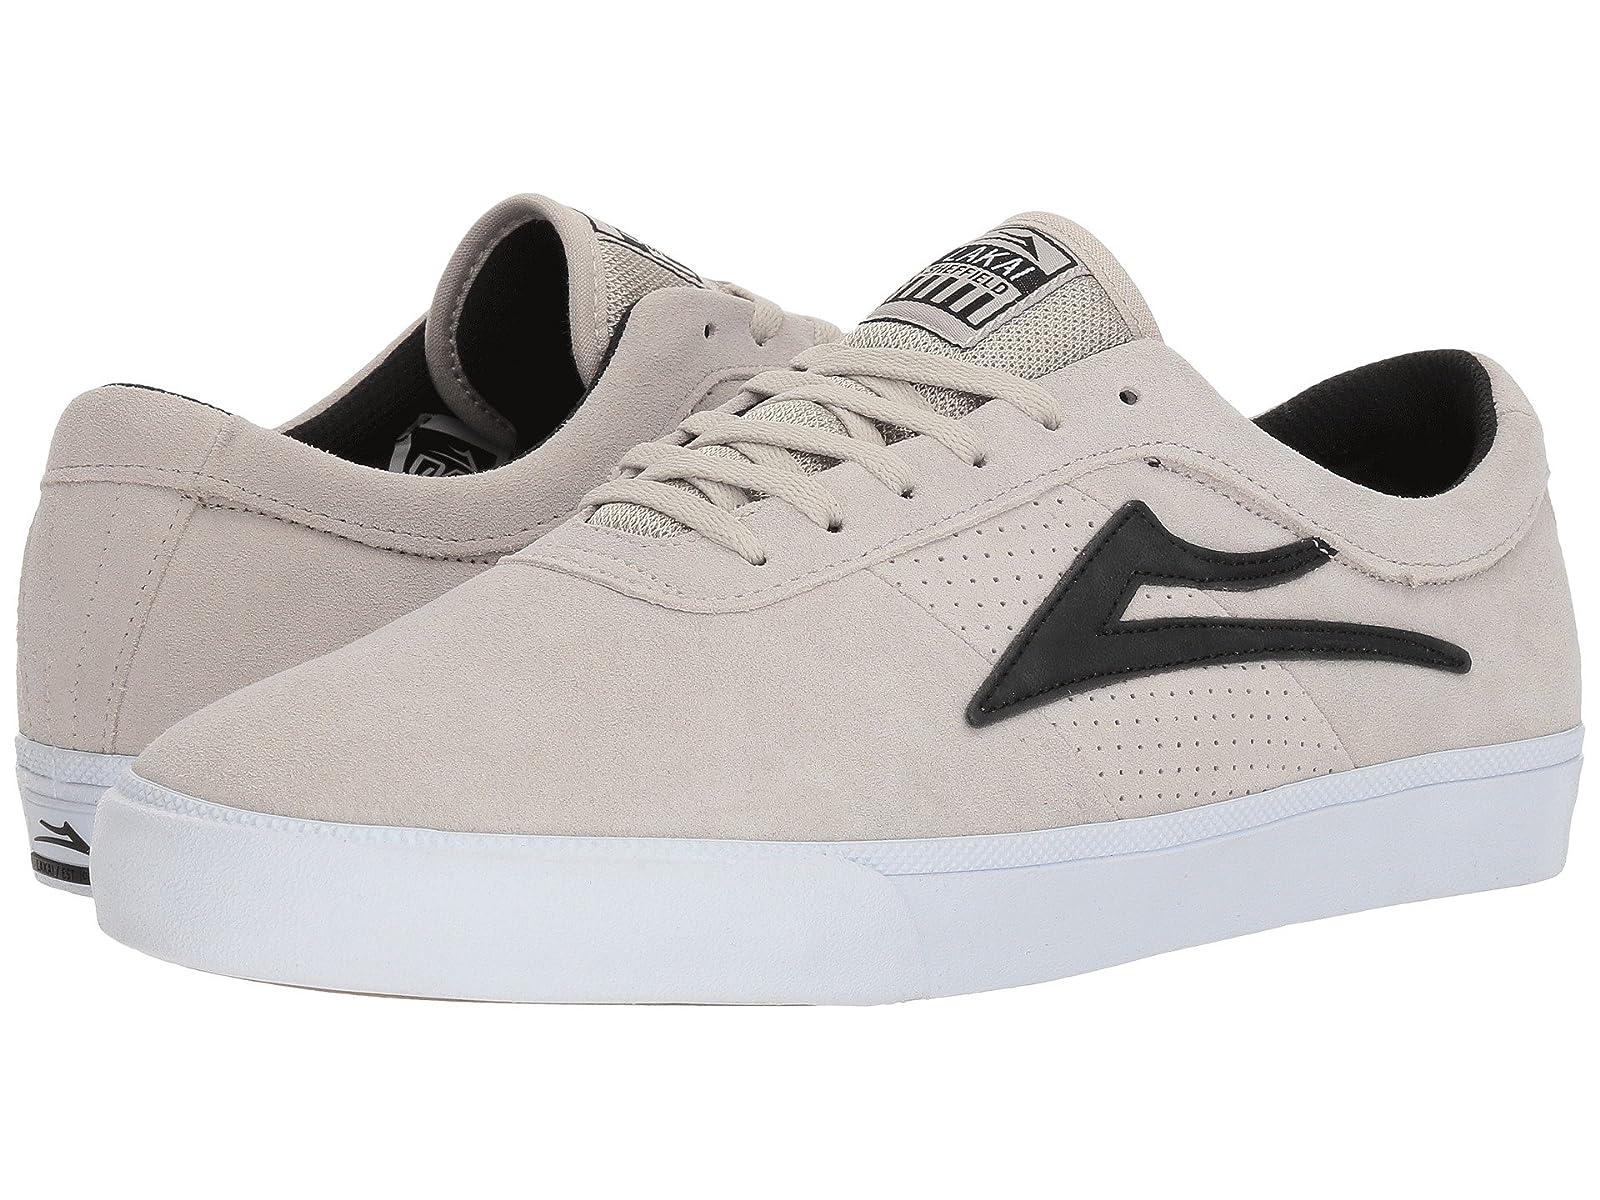 Lakai SheffieldAtmospheric grades have affordable shoes